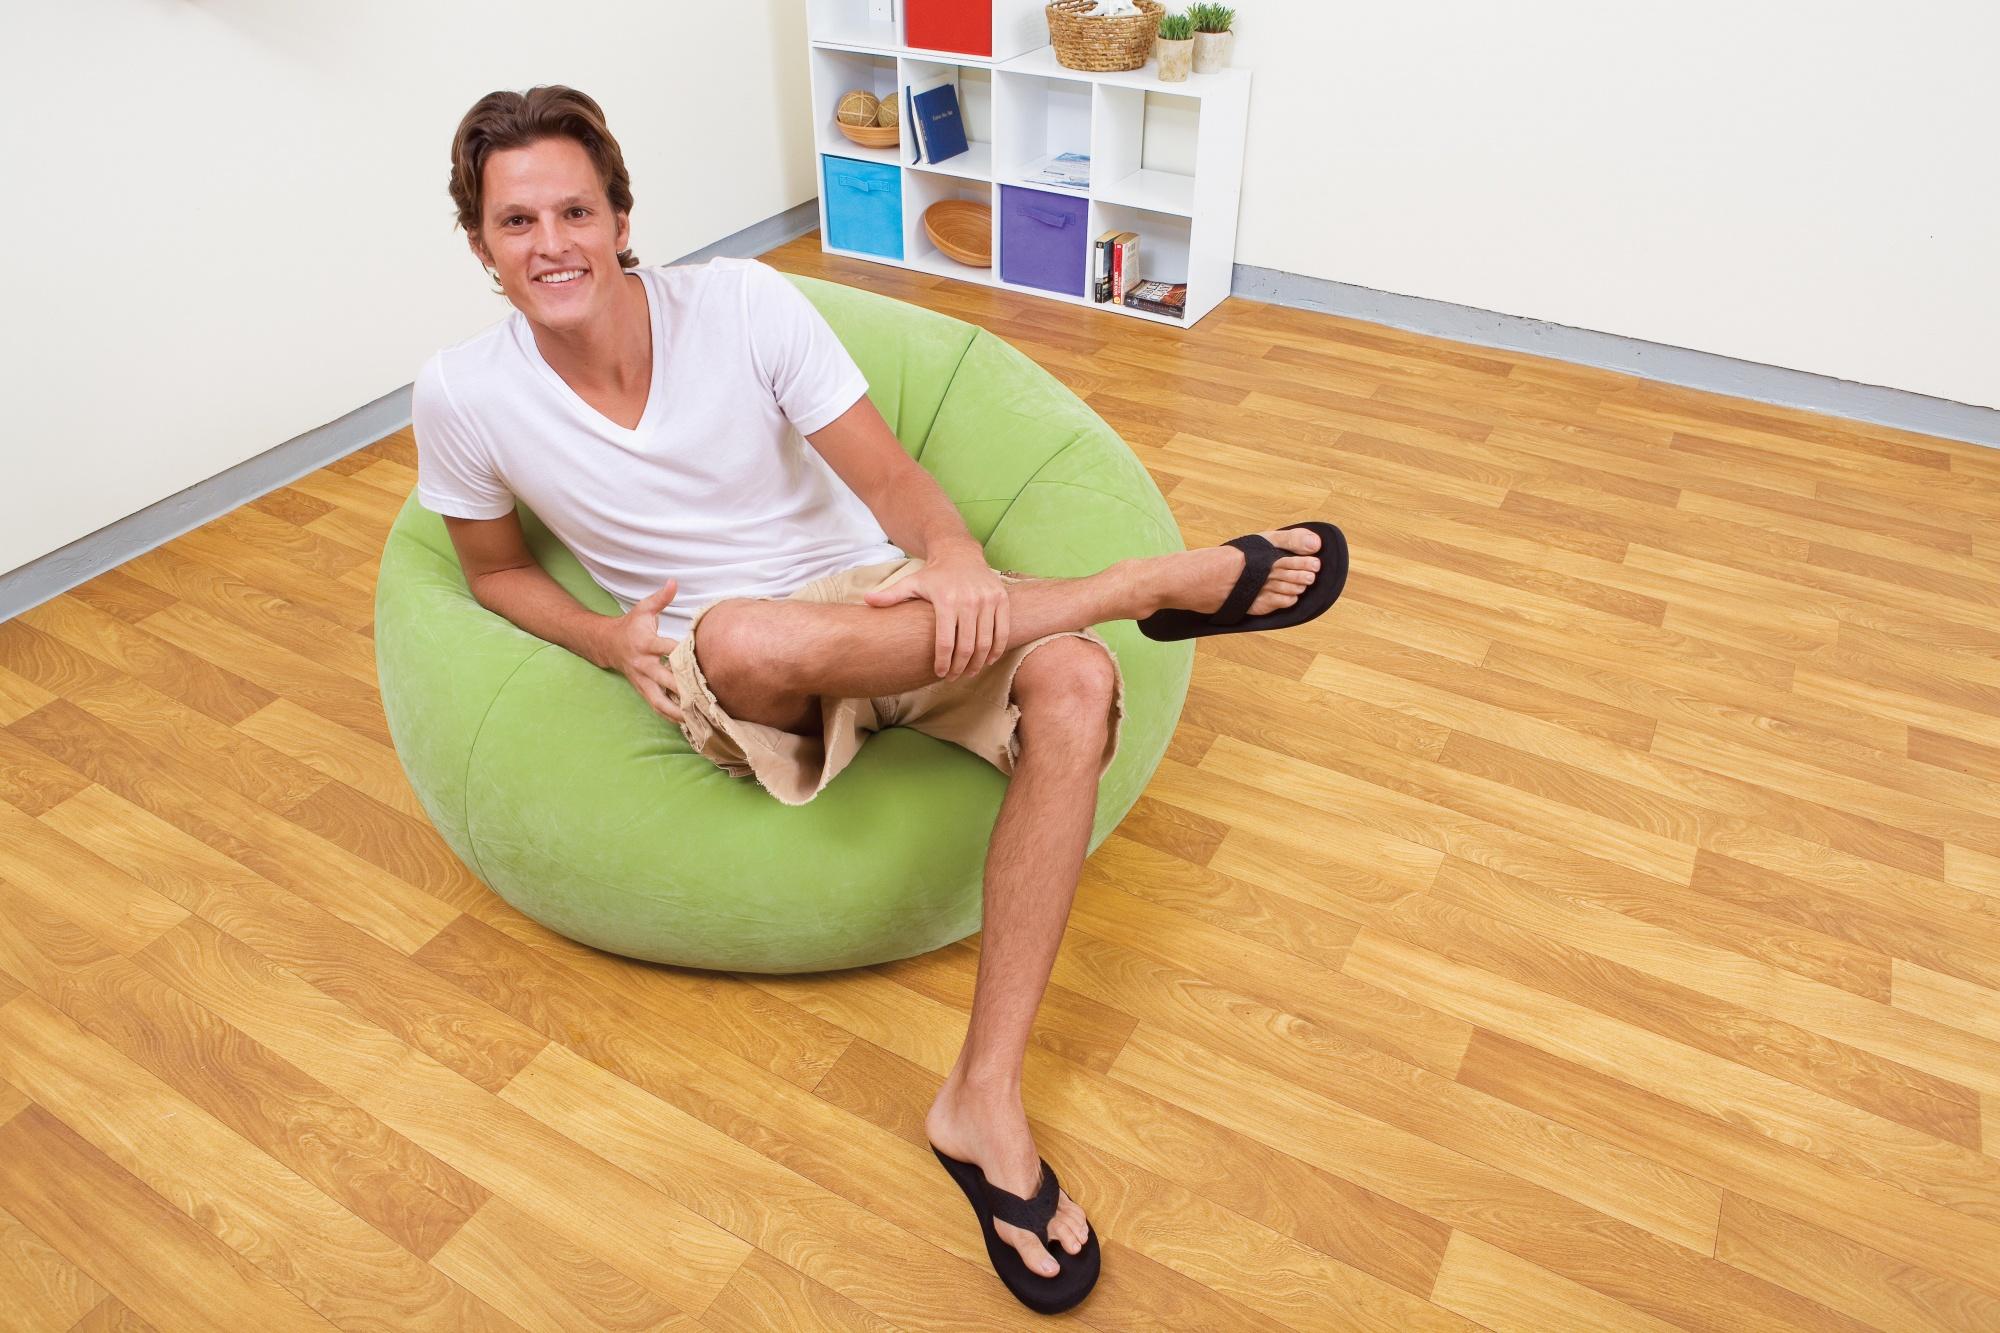 Opblaasbare Lounge Stoel.Intex Opblaasbare Loungestoel Groen 104 X 107 X 69 Cm Internet